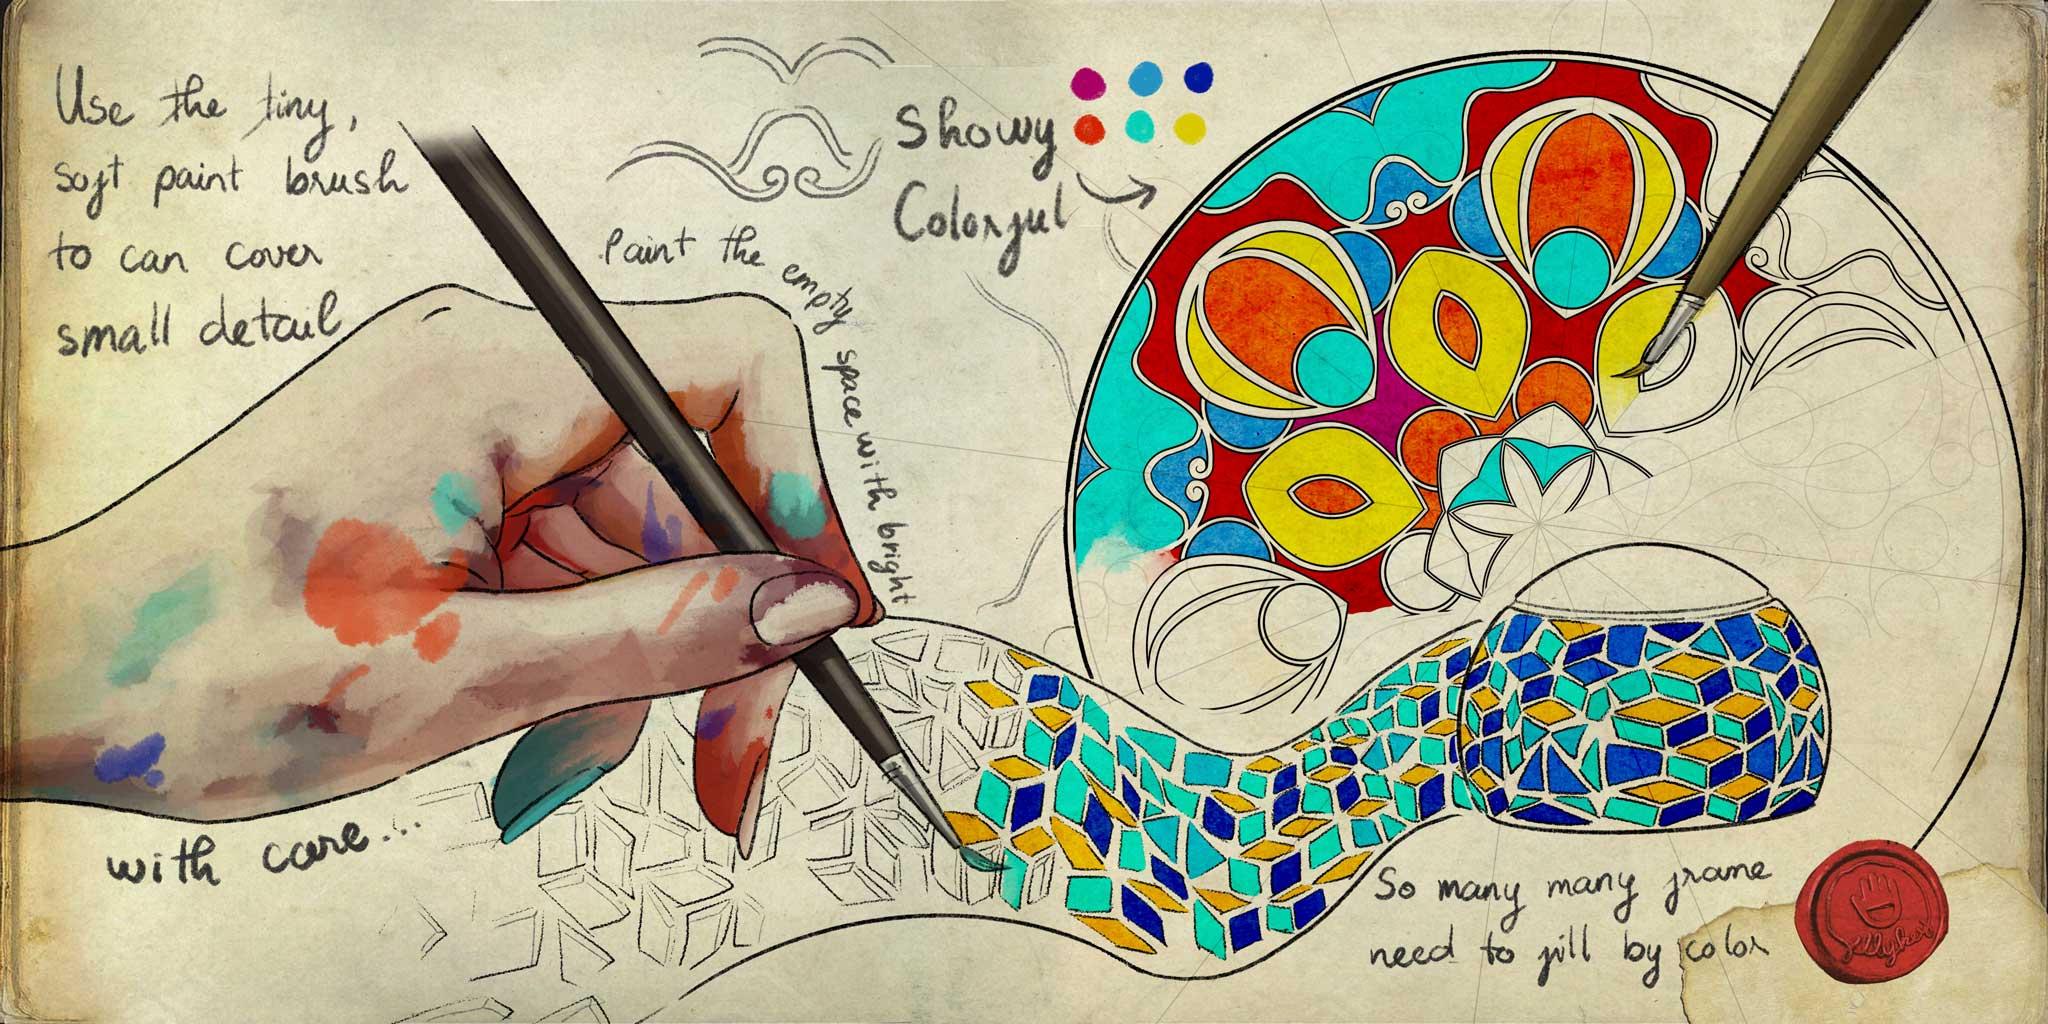 Jelly Key Sketch 2